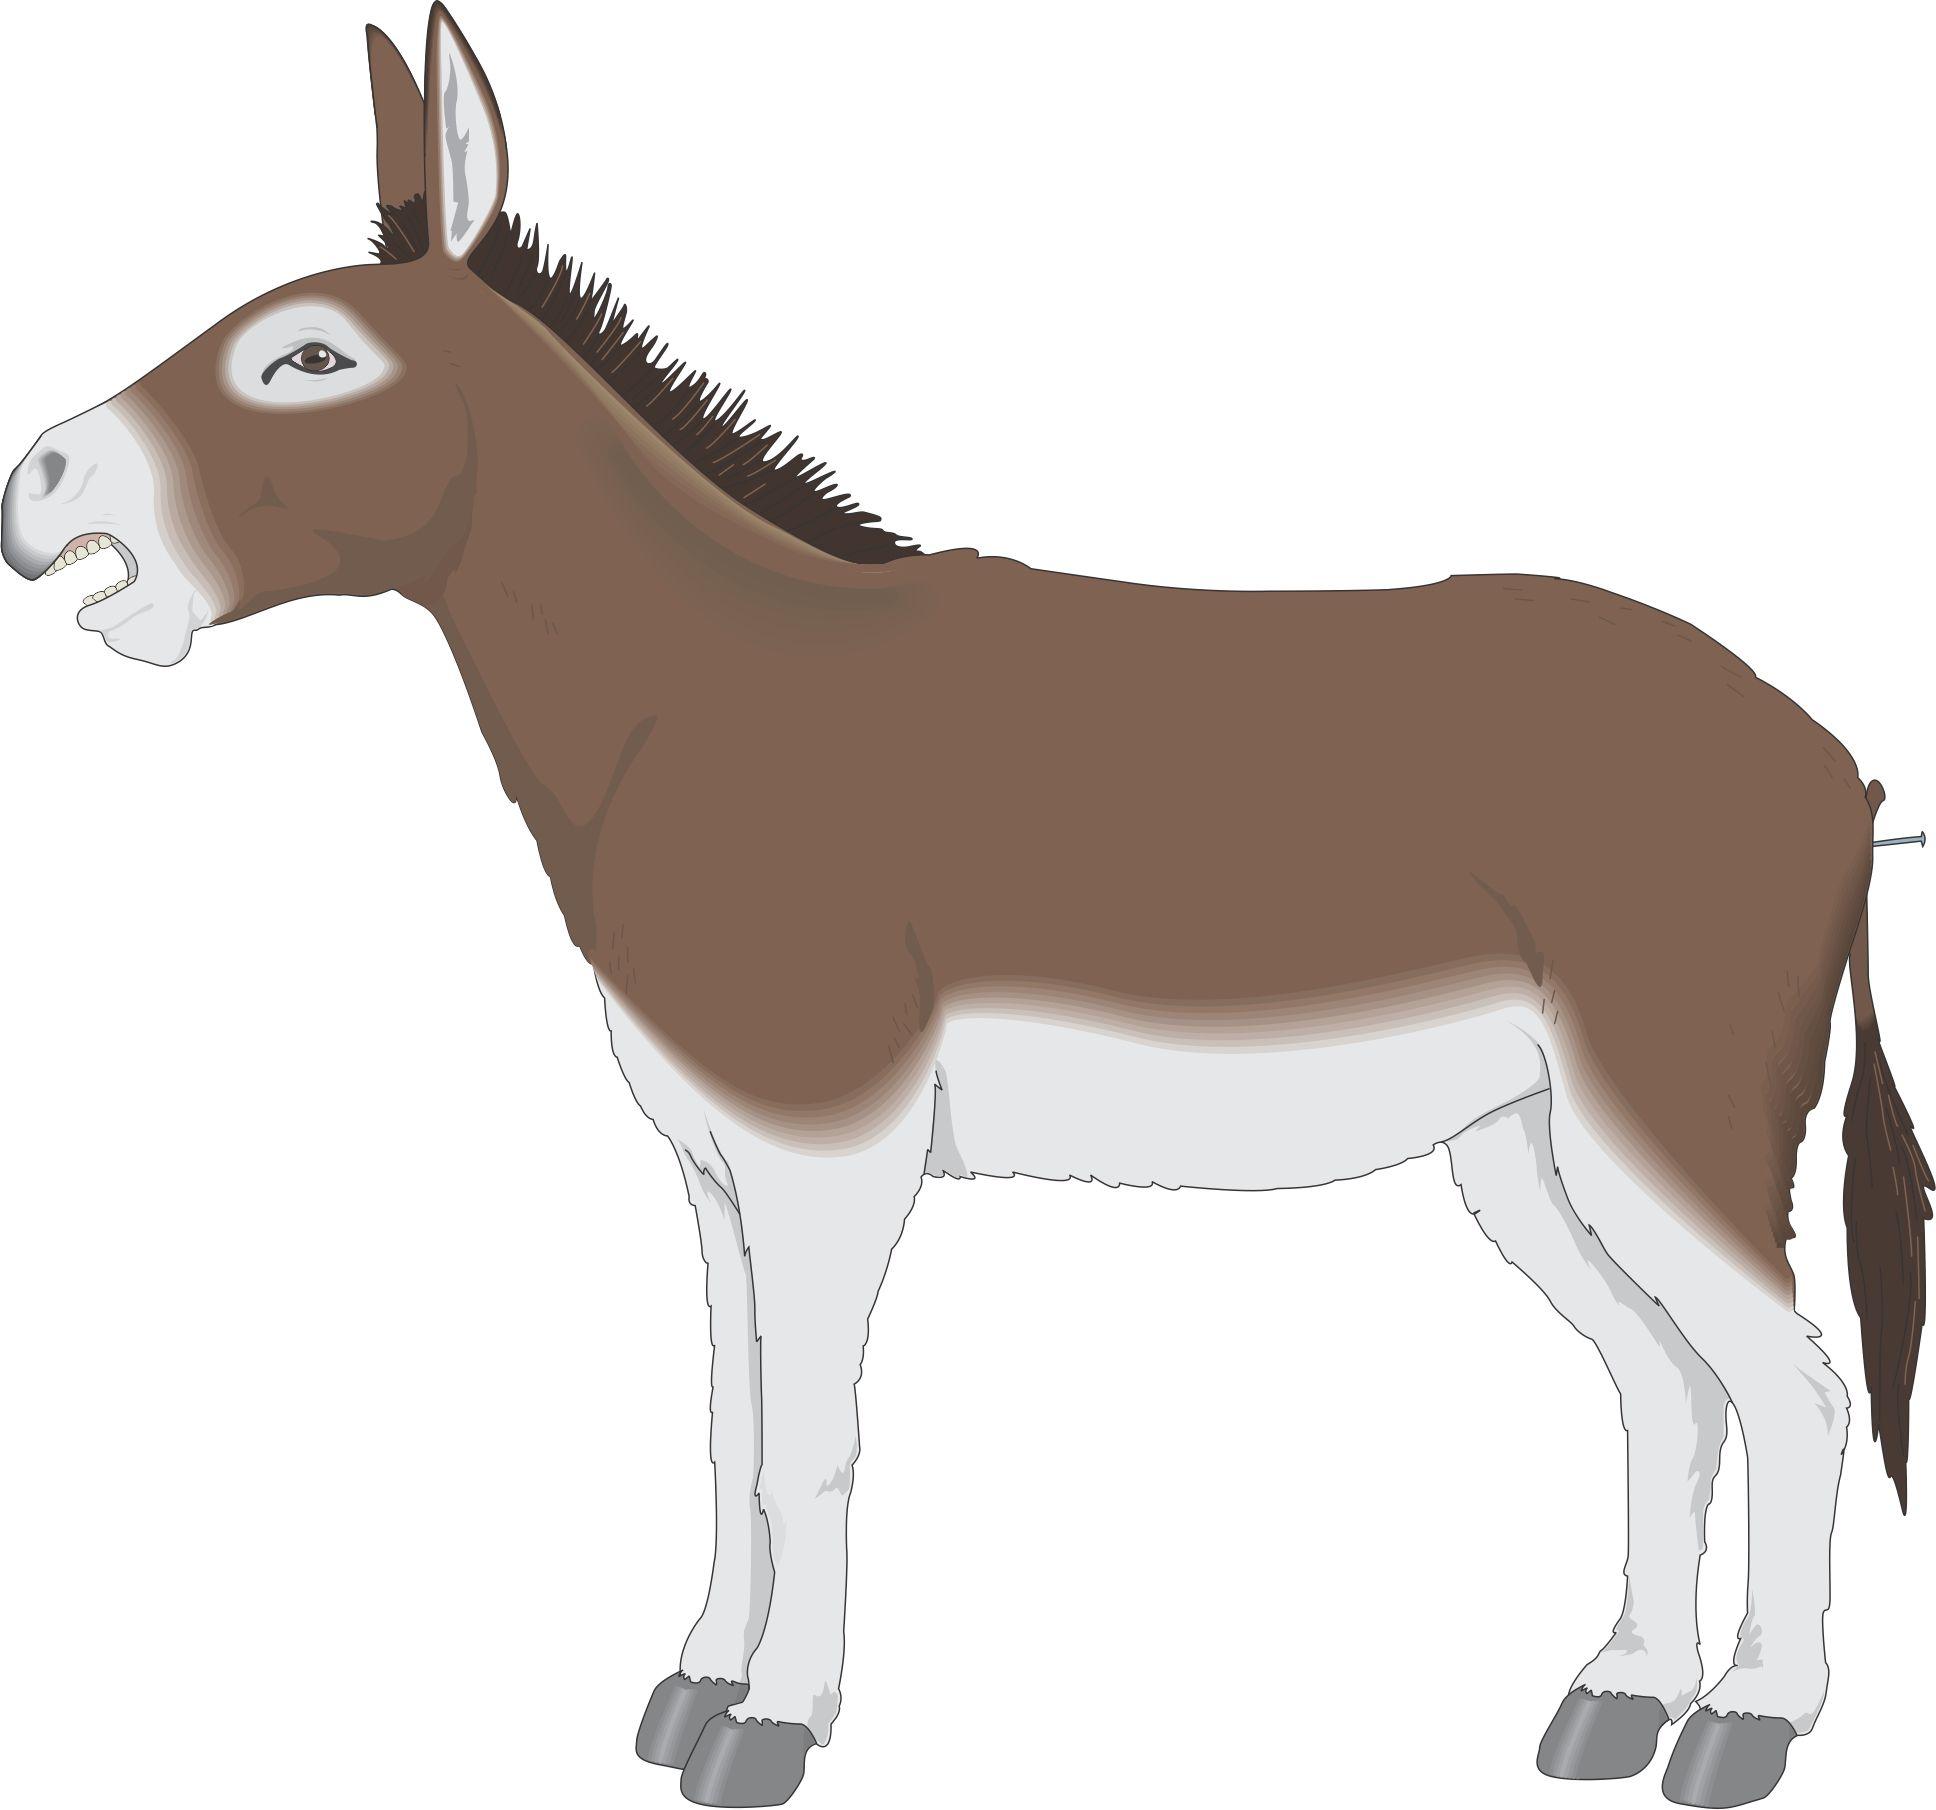 cartoon mule back to cartoon clipart from cartoon donkey this list rh pinterest com donkey clipart png donkey clipart free